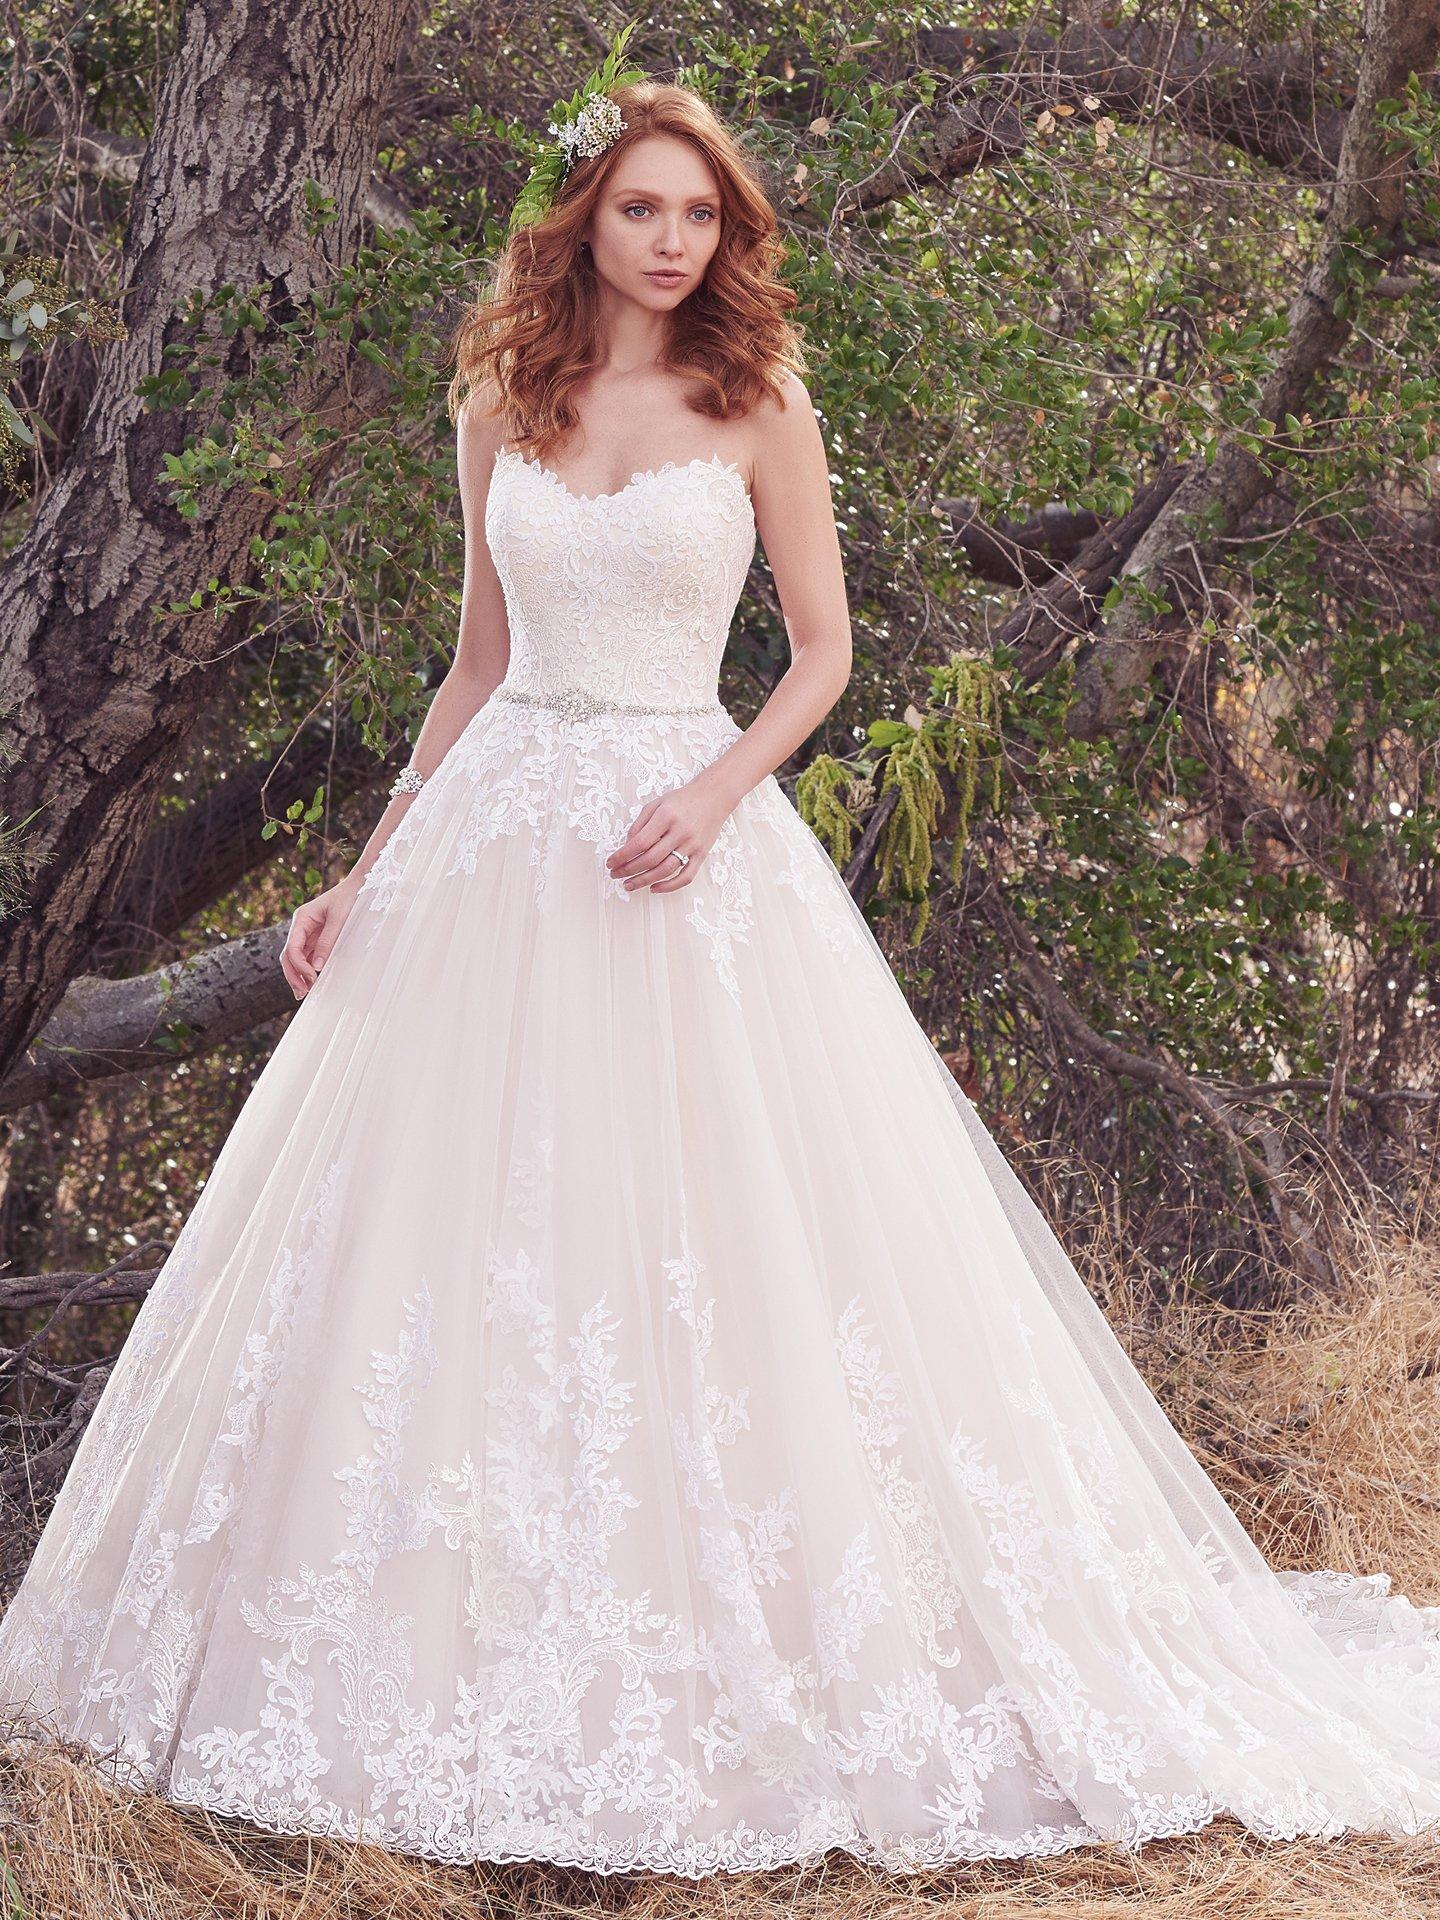 Maggie-Sottero-Wedding-Dress-Irma-7MS933-Alt2.jpg